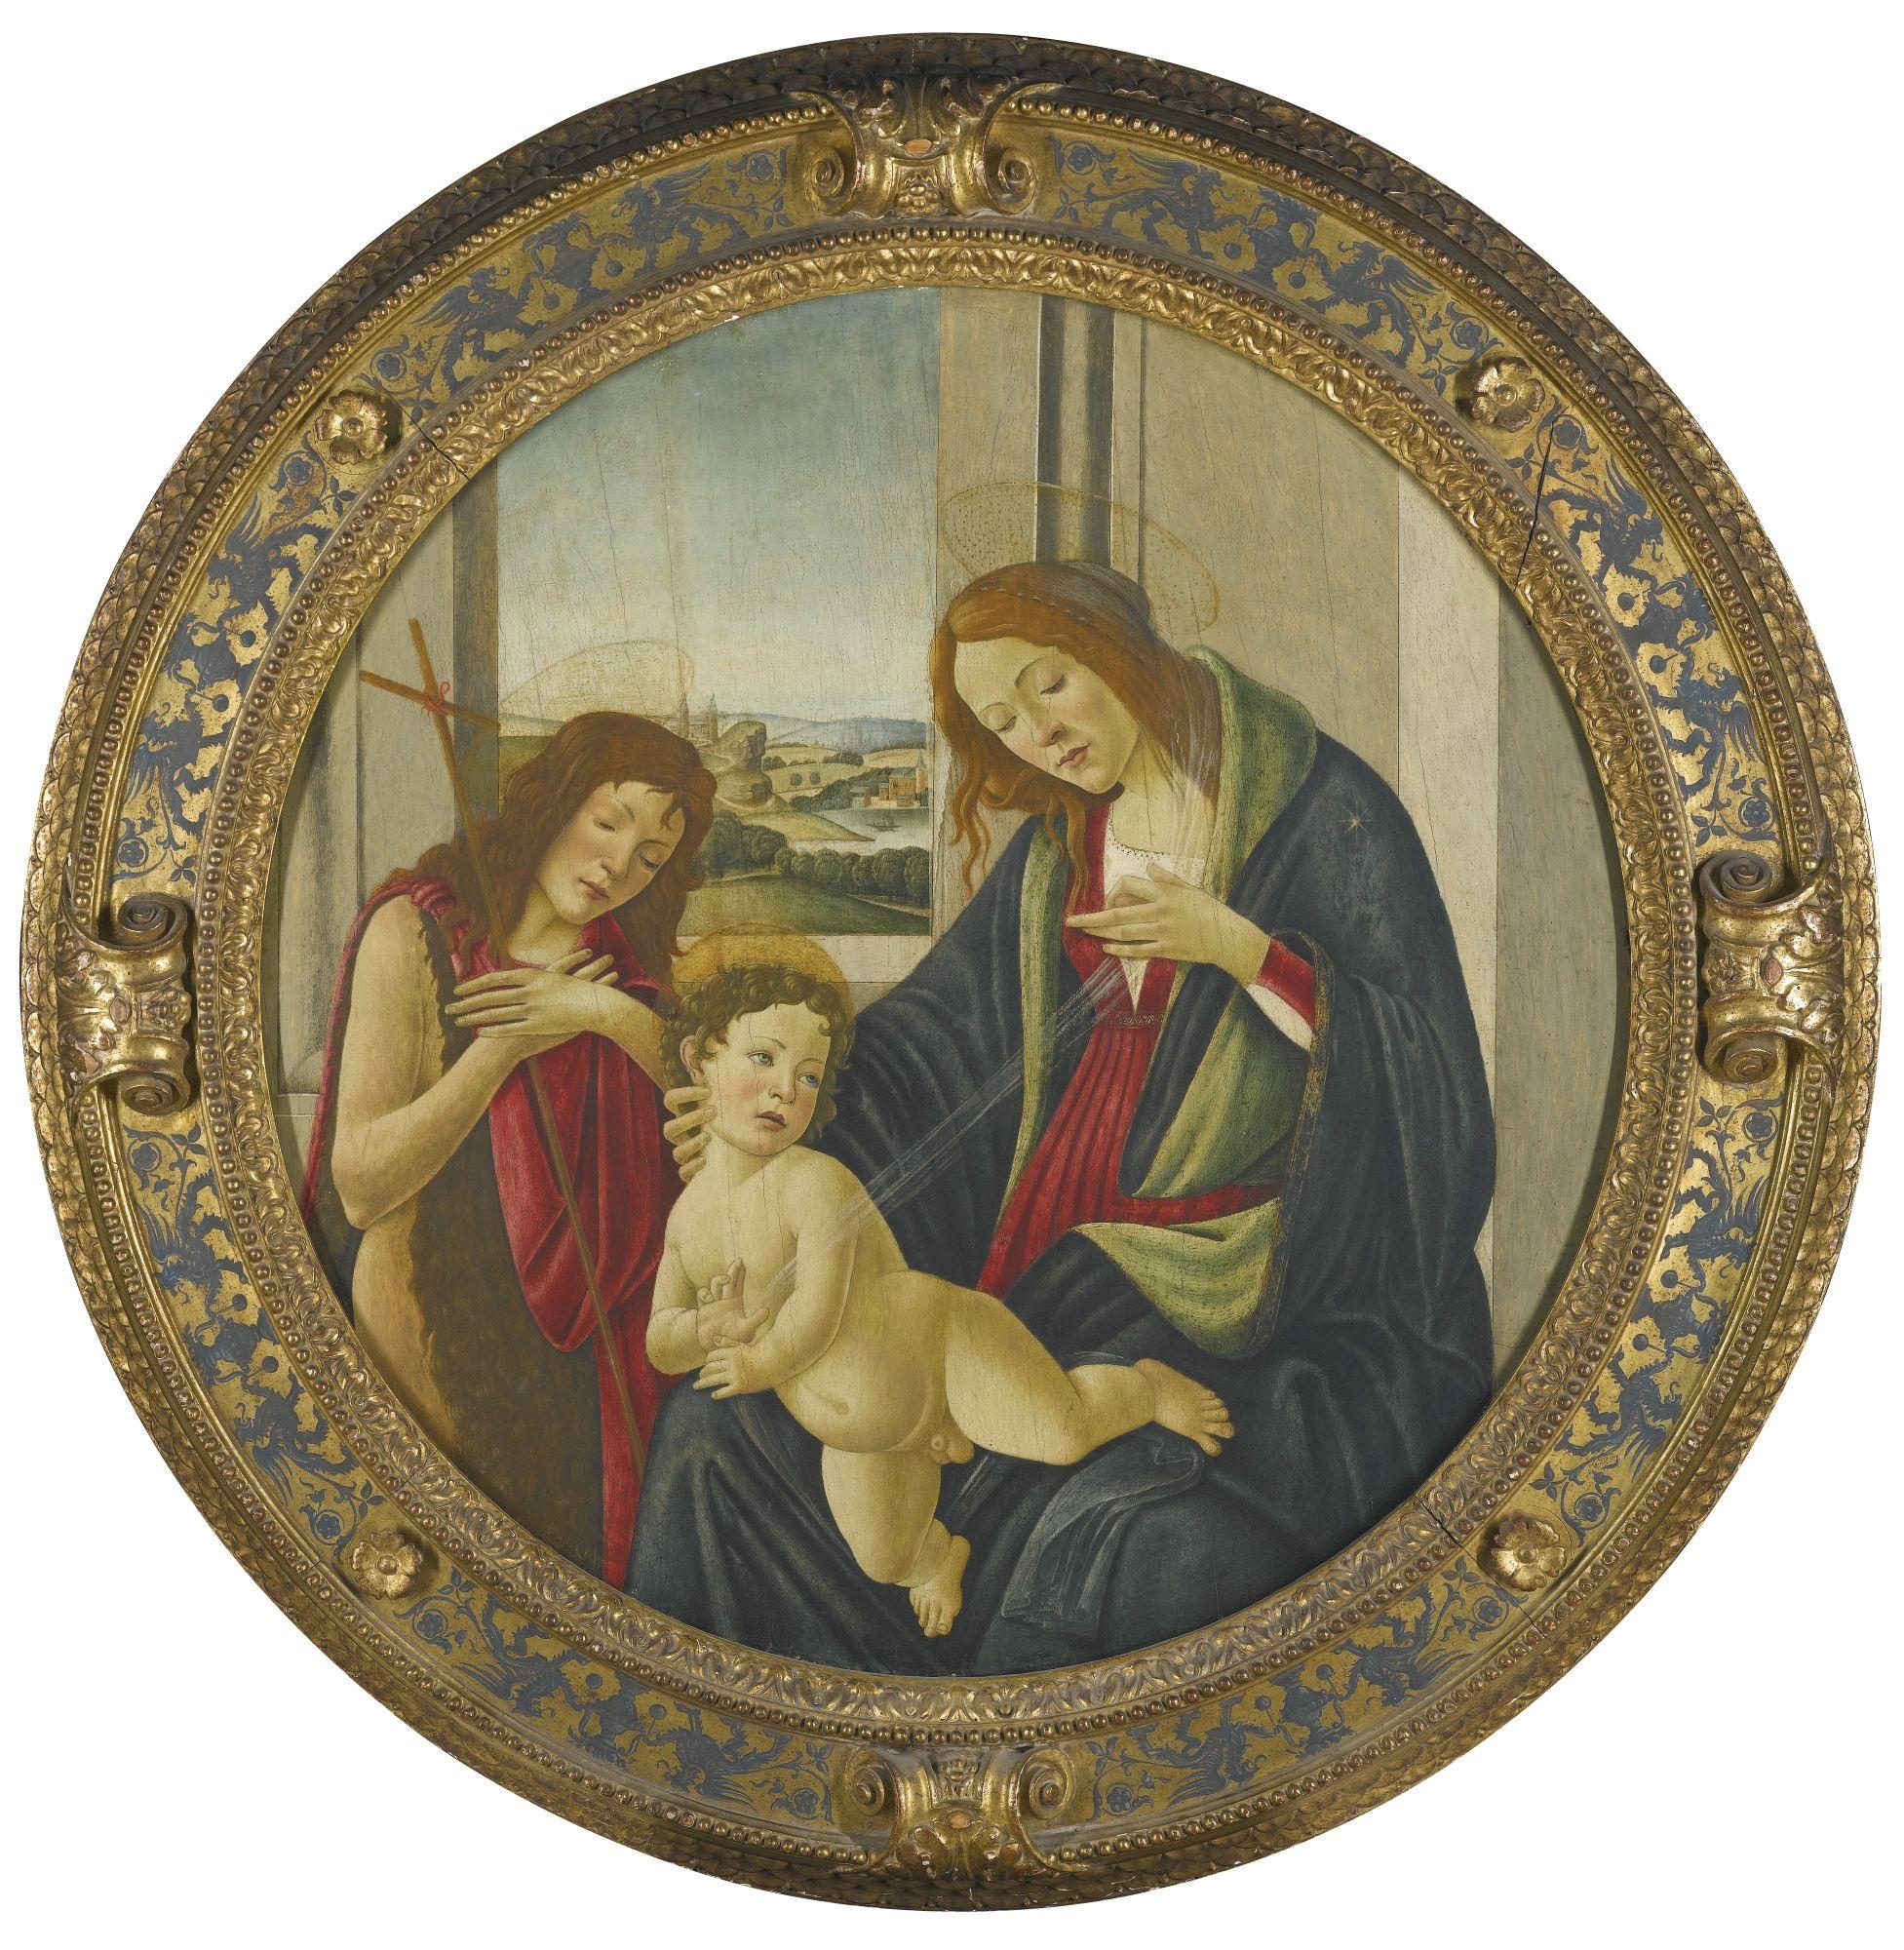 Workshop of Alessandro Filipepi, called Sandro Botticelli   lot   Sotheby's